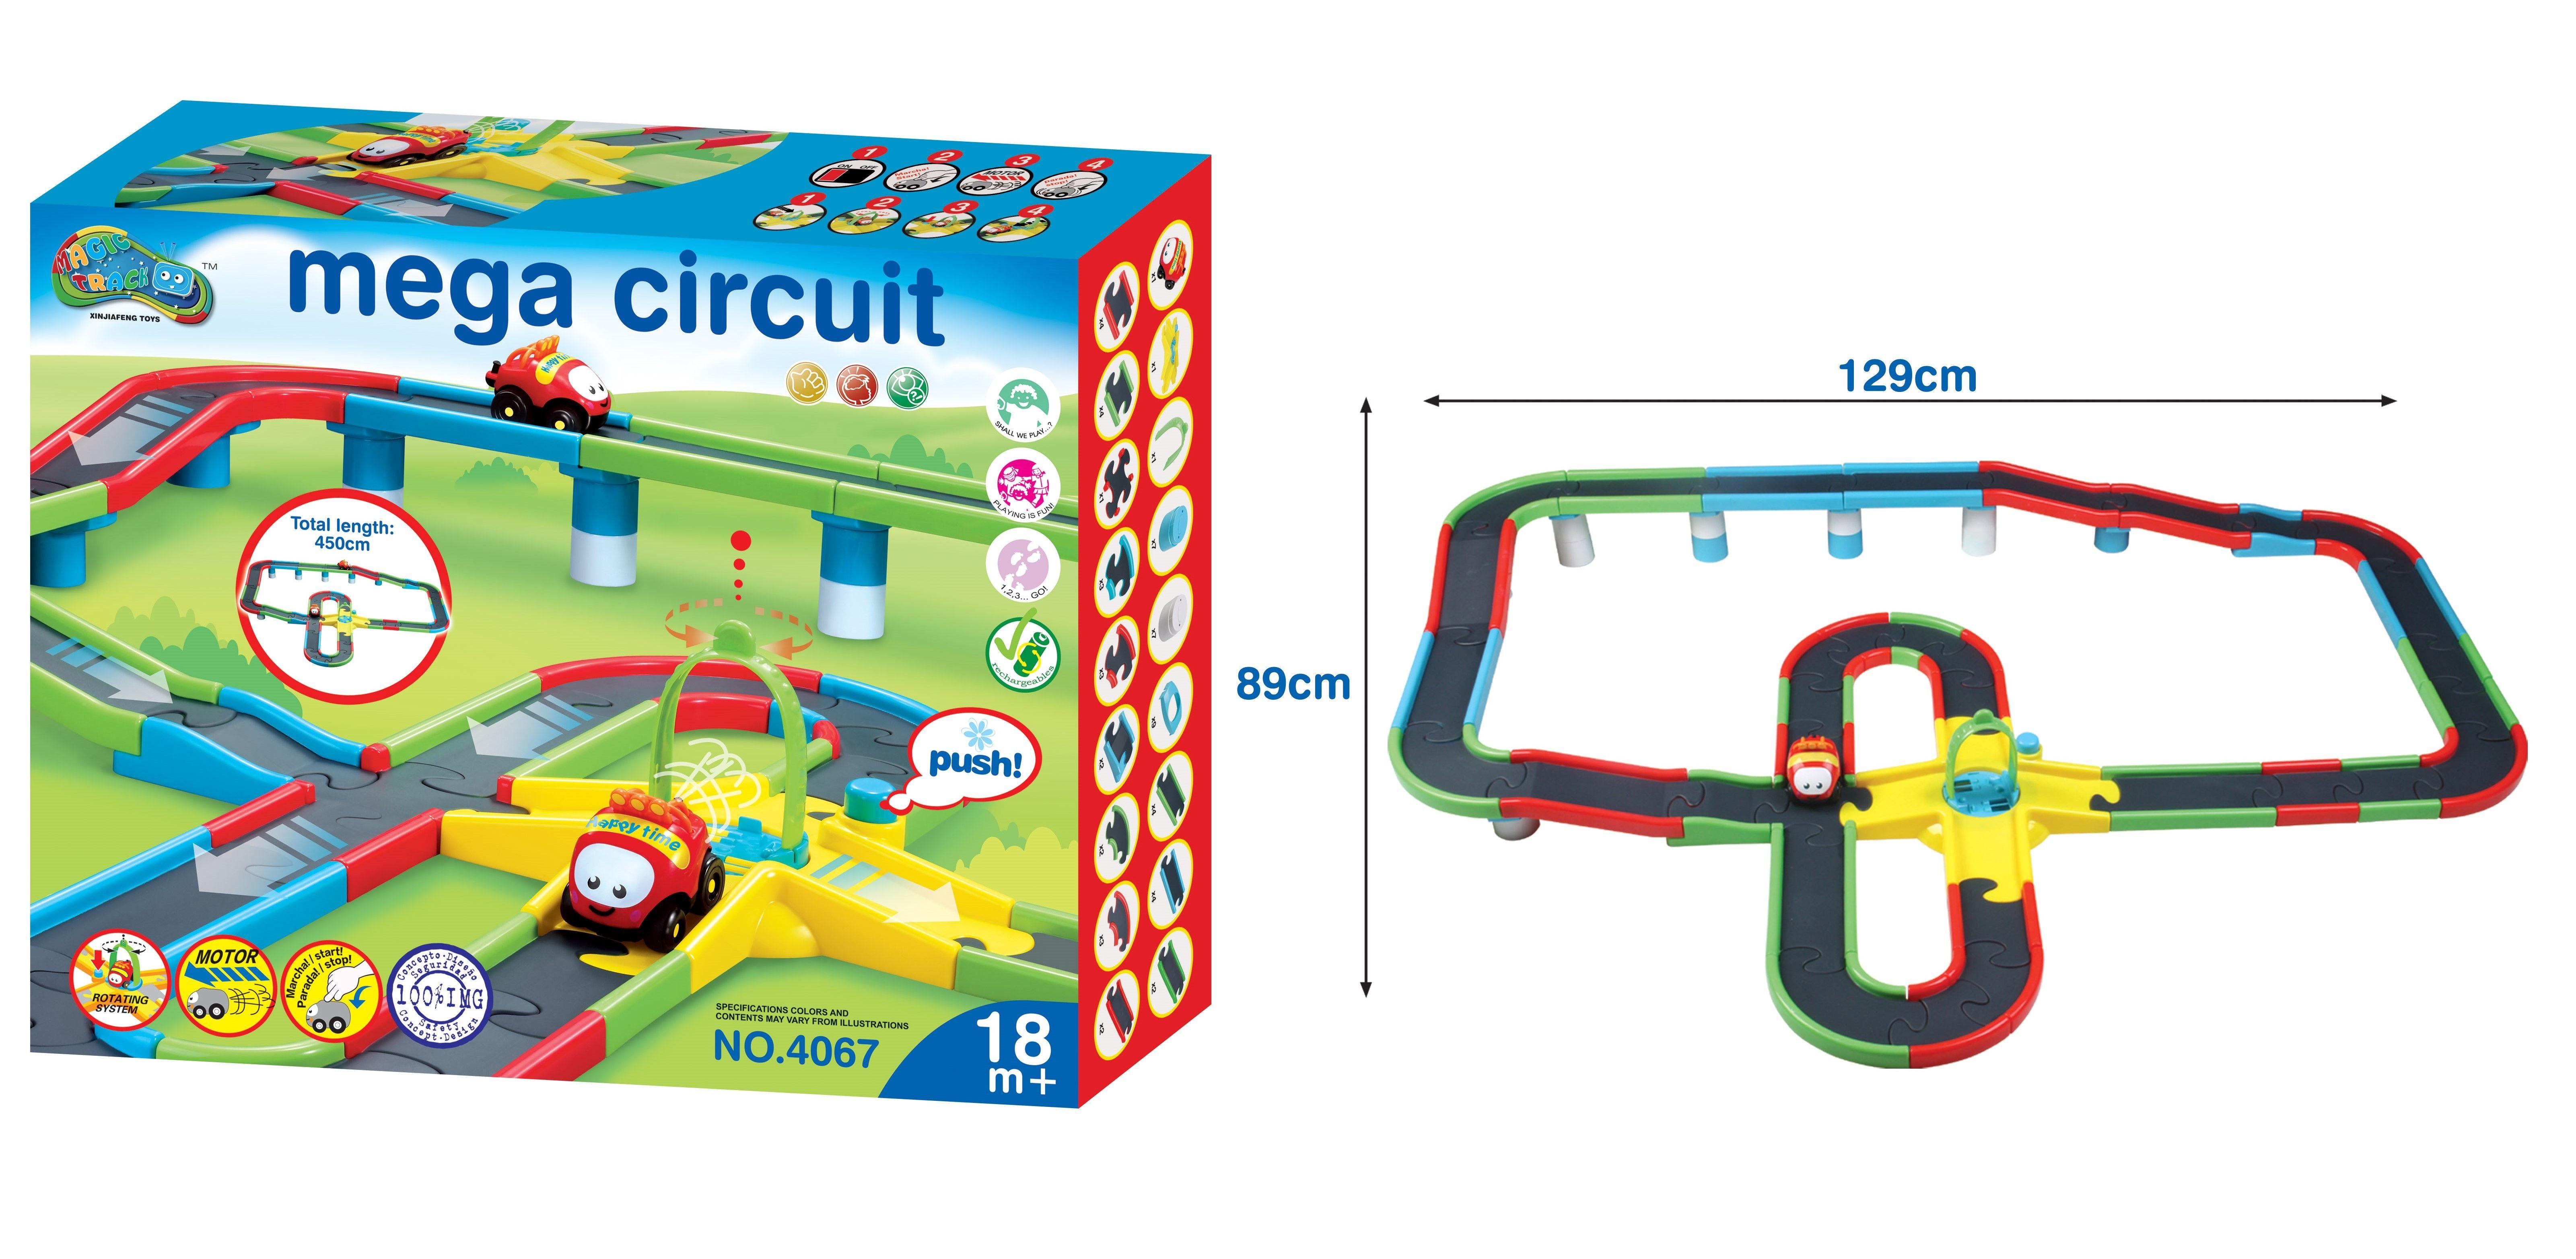 Mega Circuit Toys For Kids 4067 Learning Toys Catalog Educational